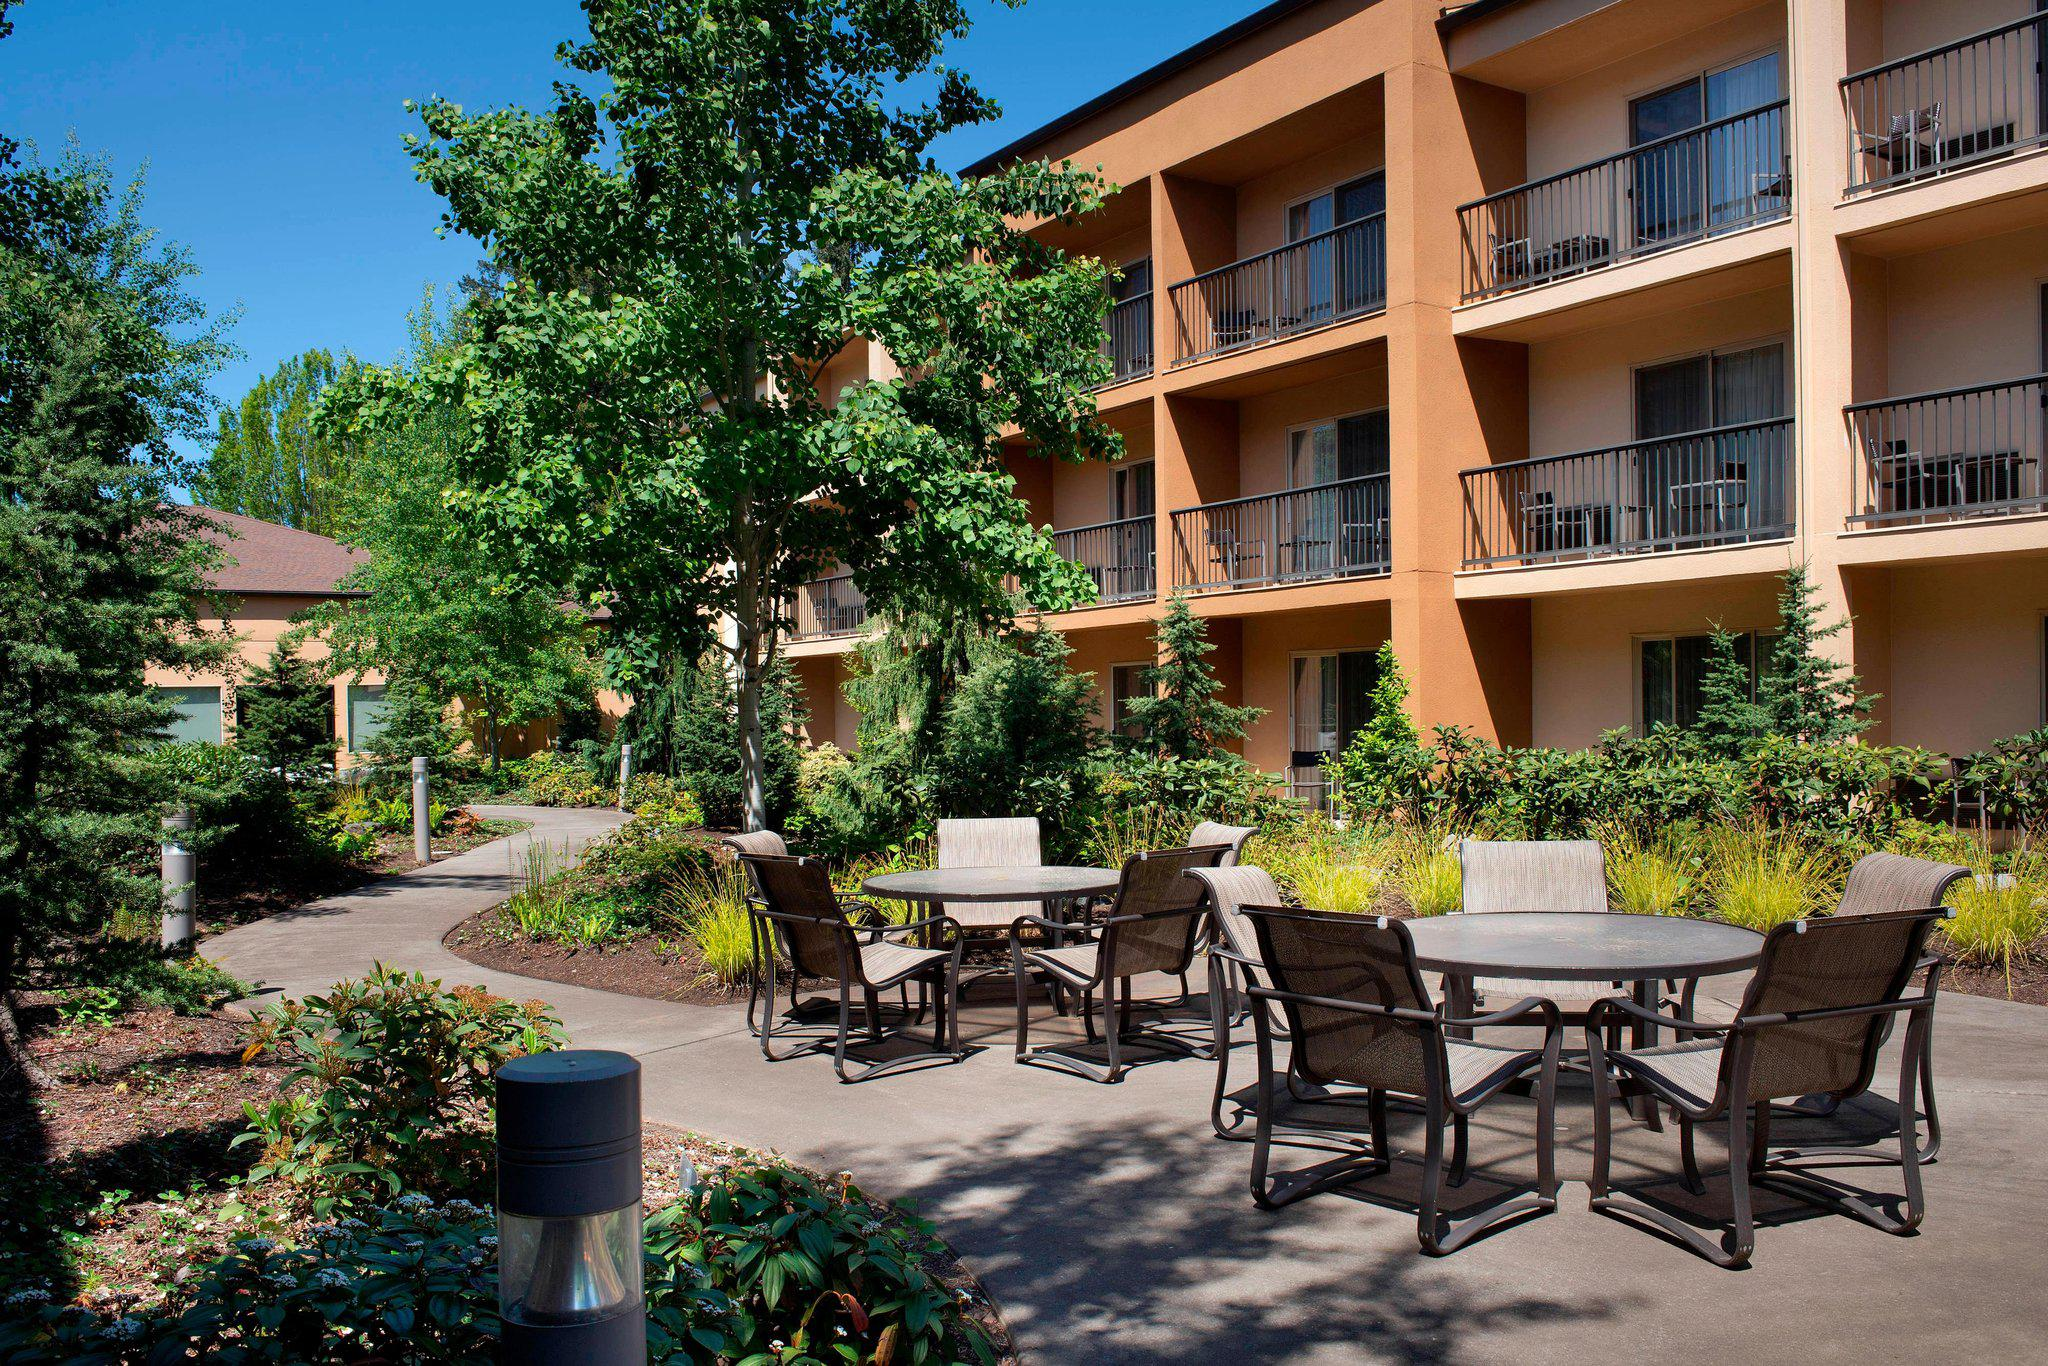 Courtyard by Marriott Portland Hillsboro